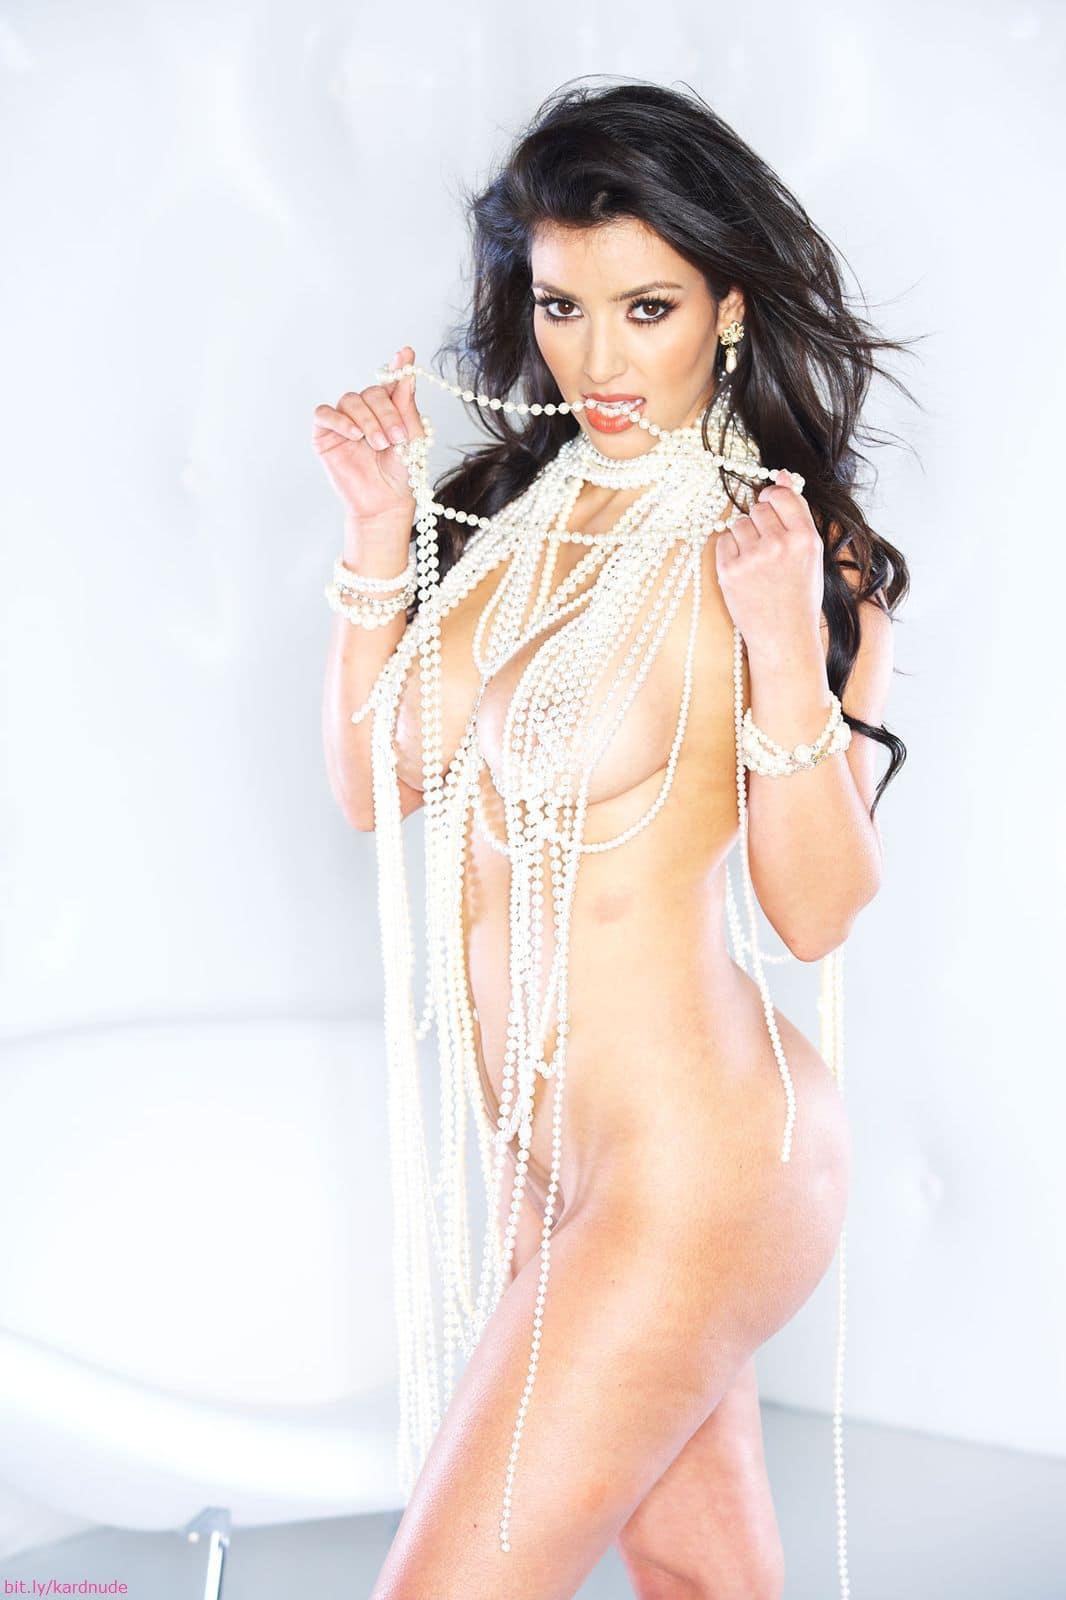 kim kardashian posing nude for playboy